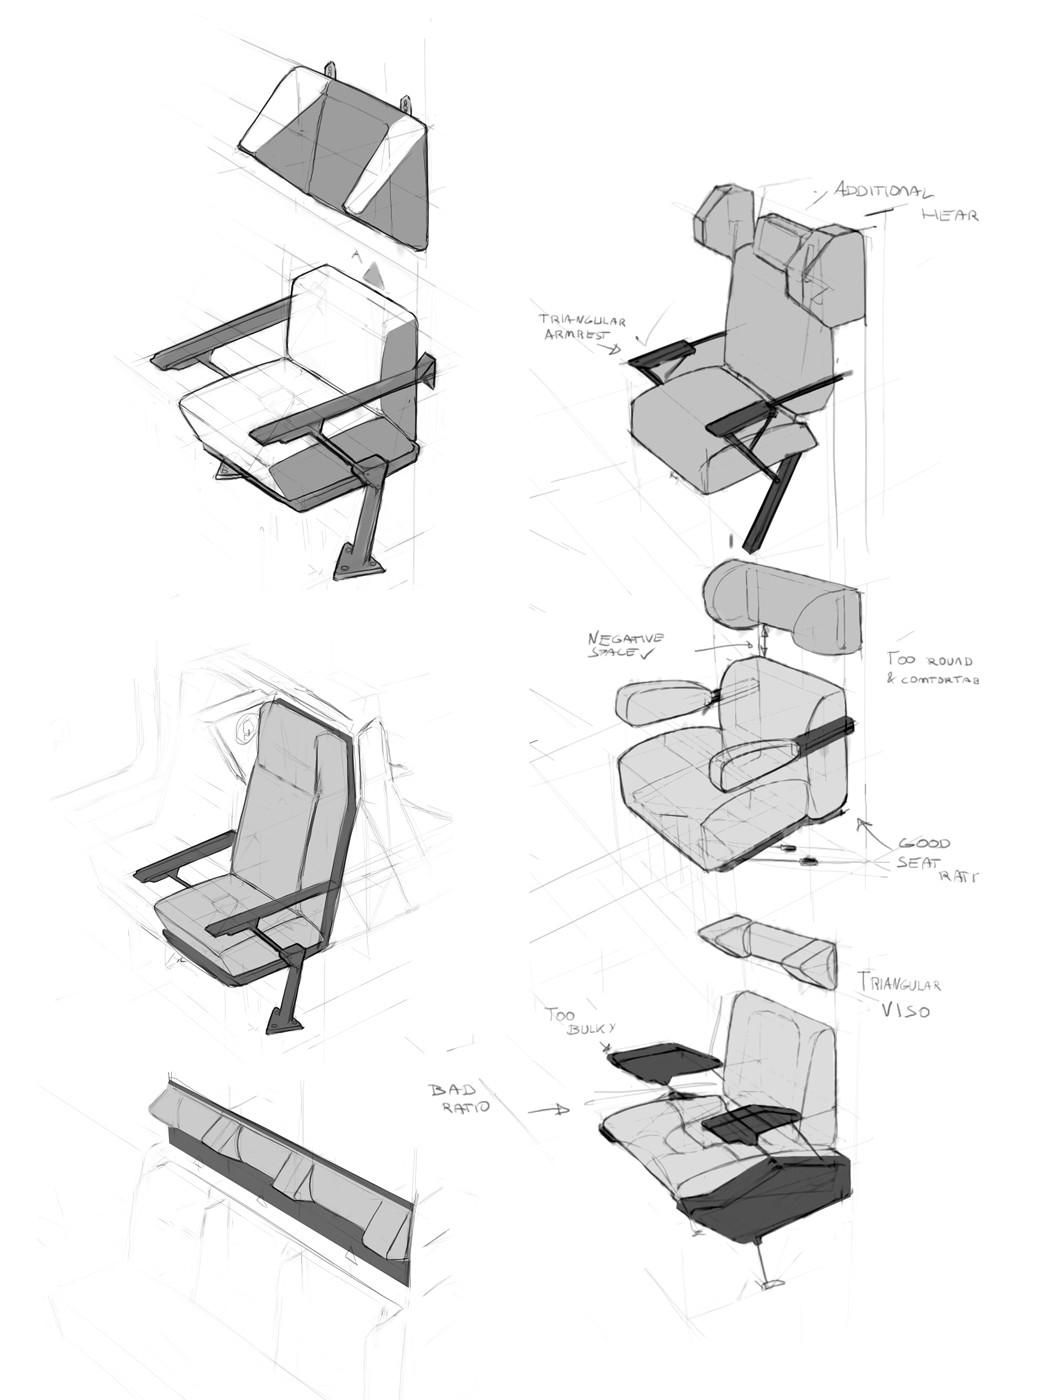 Adam daroszewski technical drawing seats